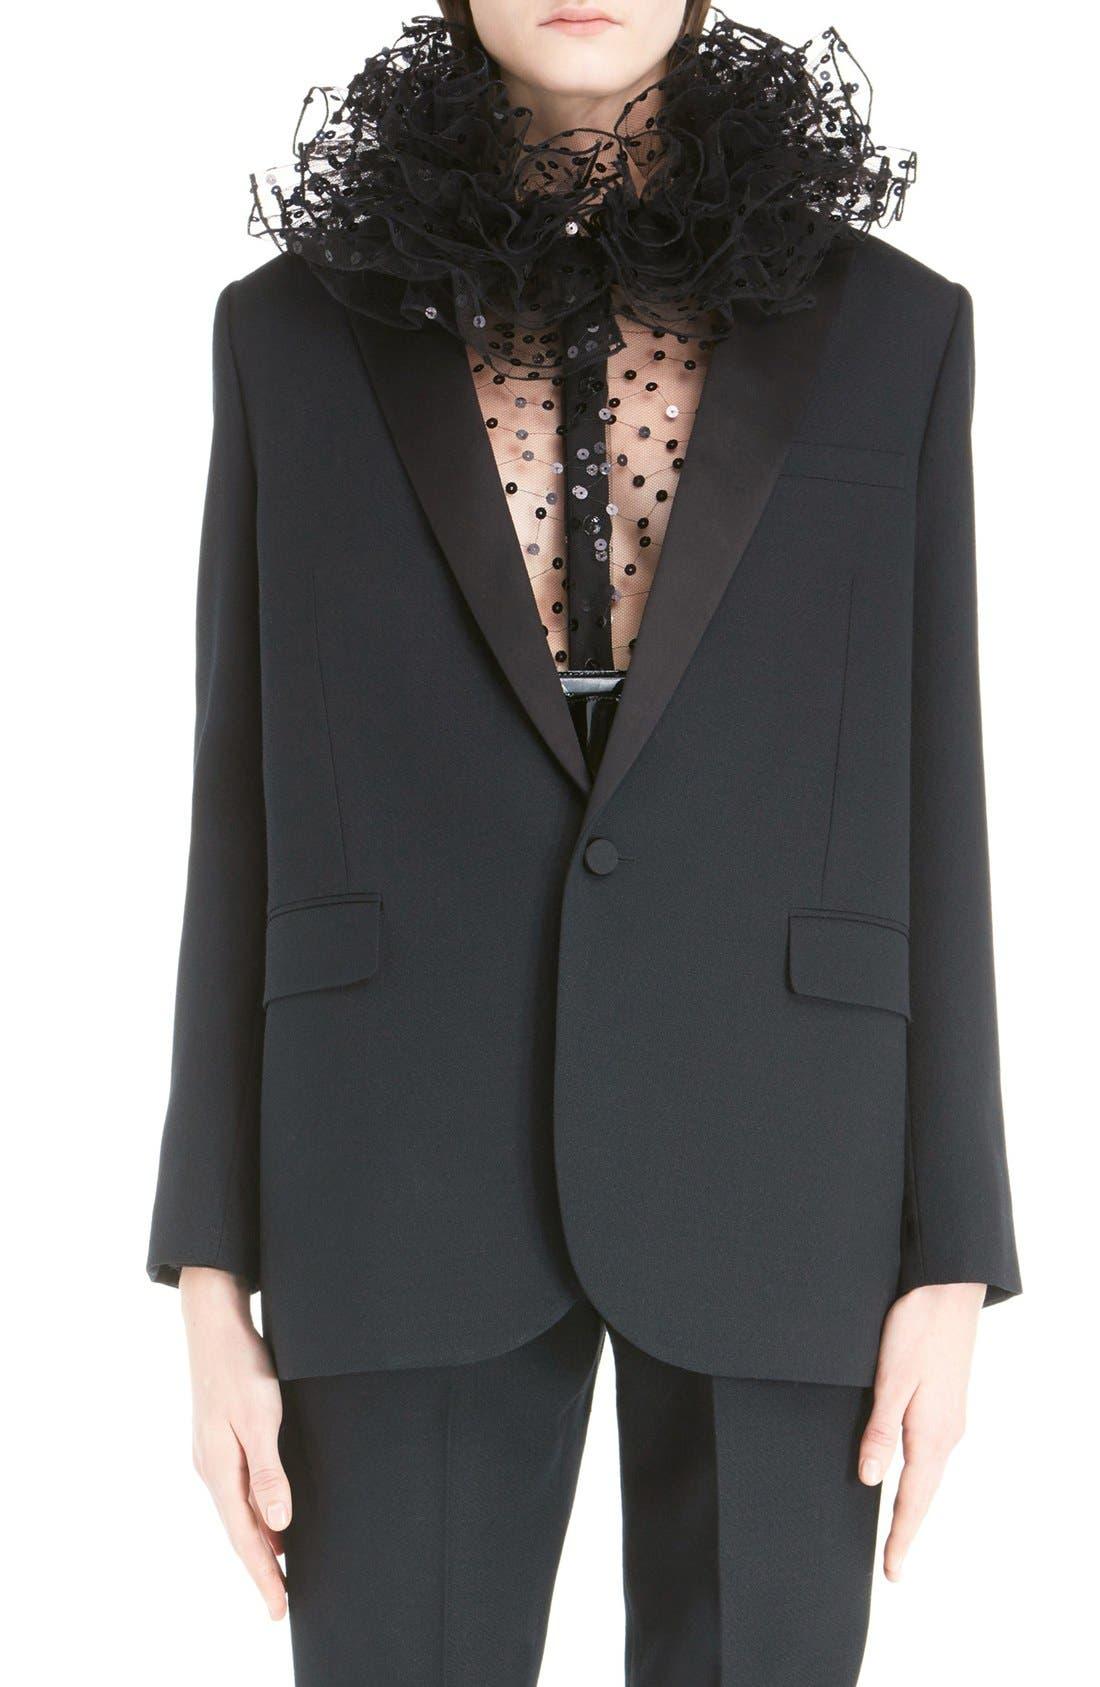 Alternate Image 1 Selected - Saint Laurent One-Button Tuxedo Jacket